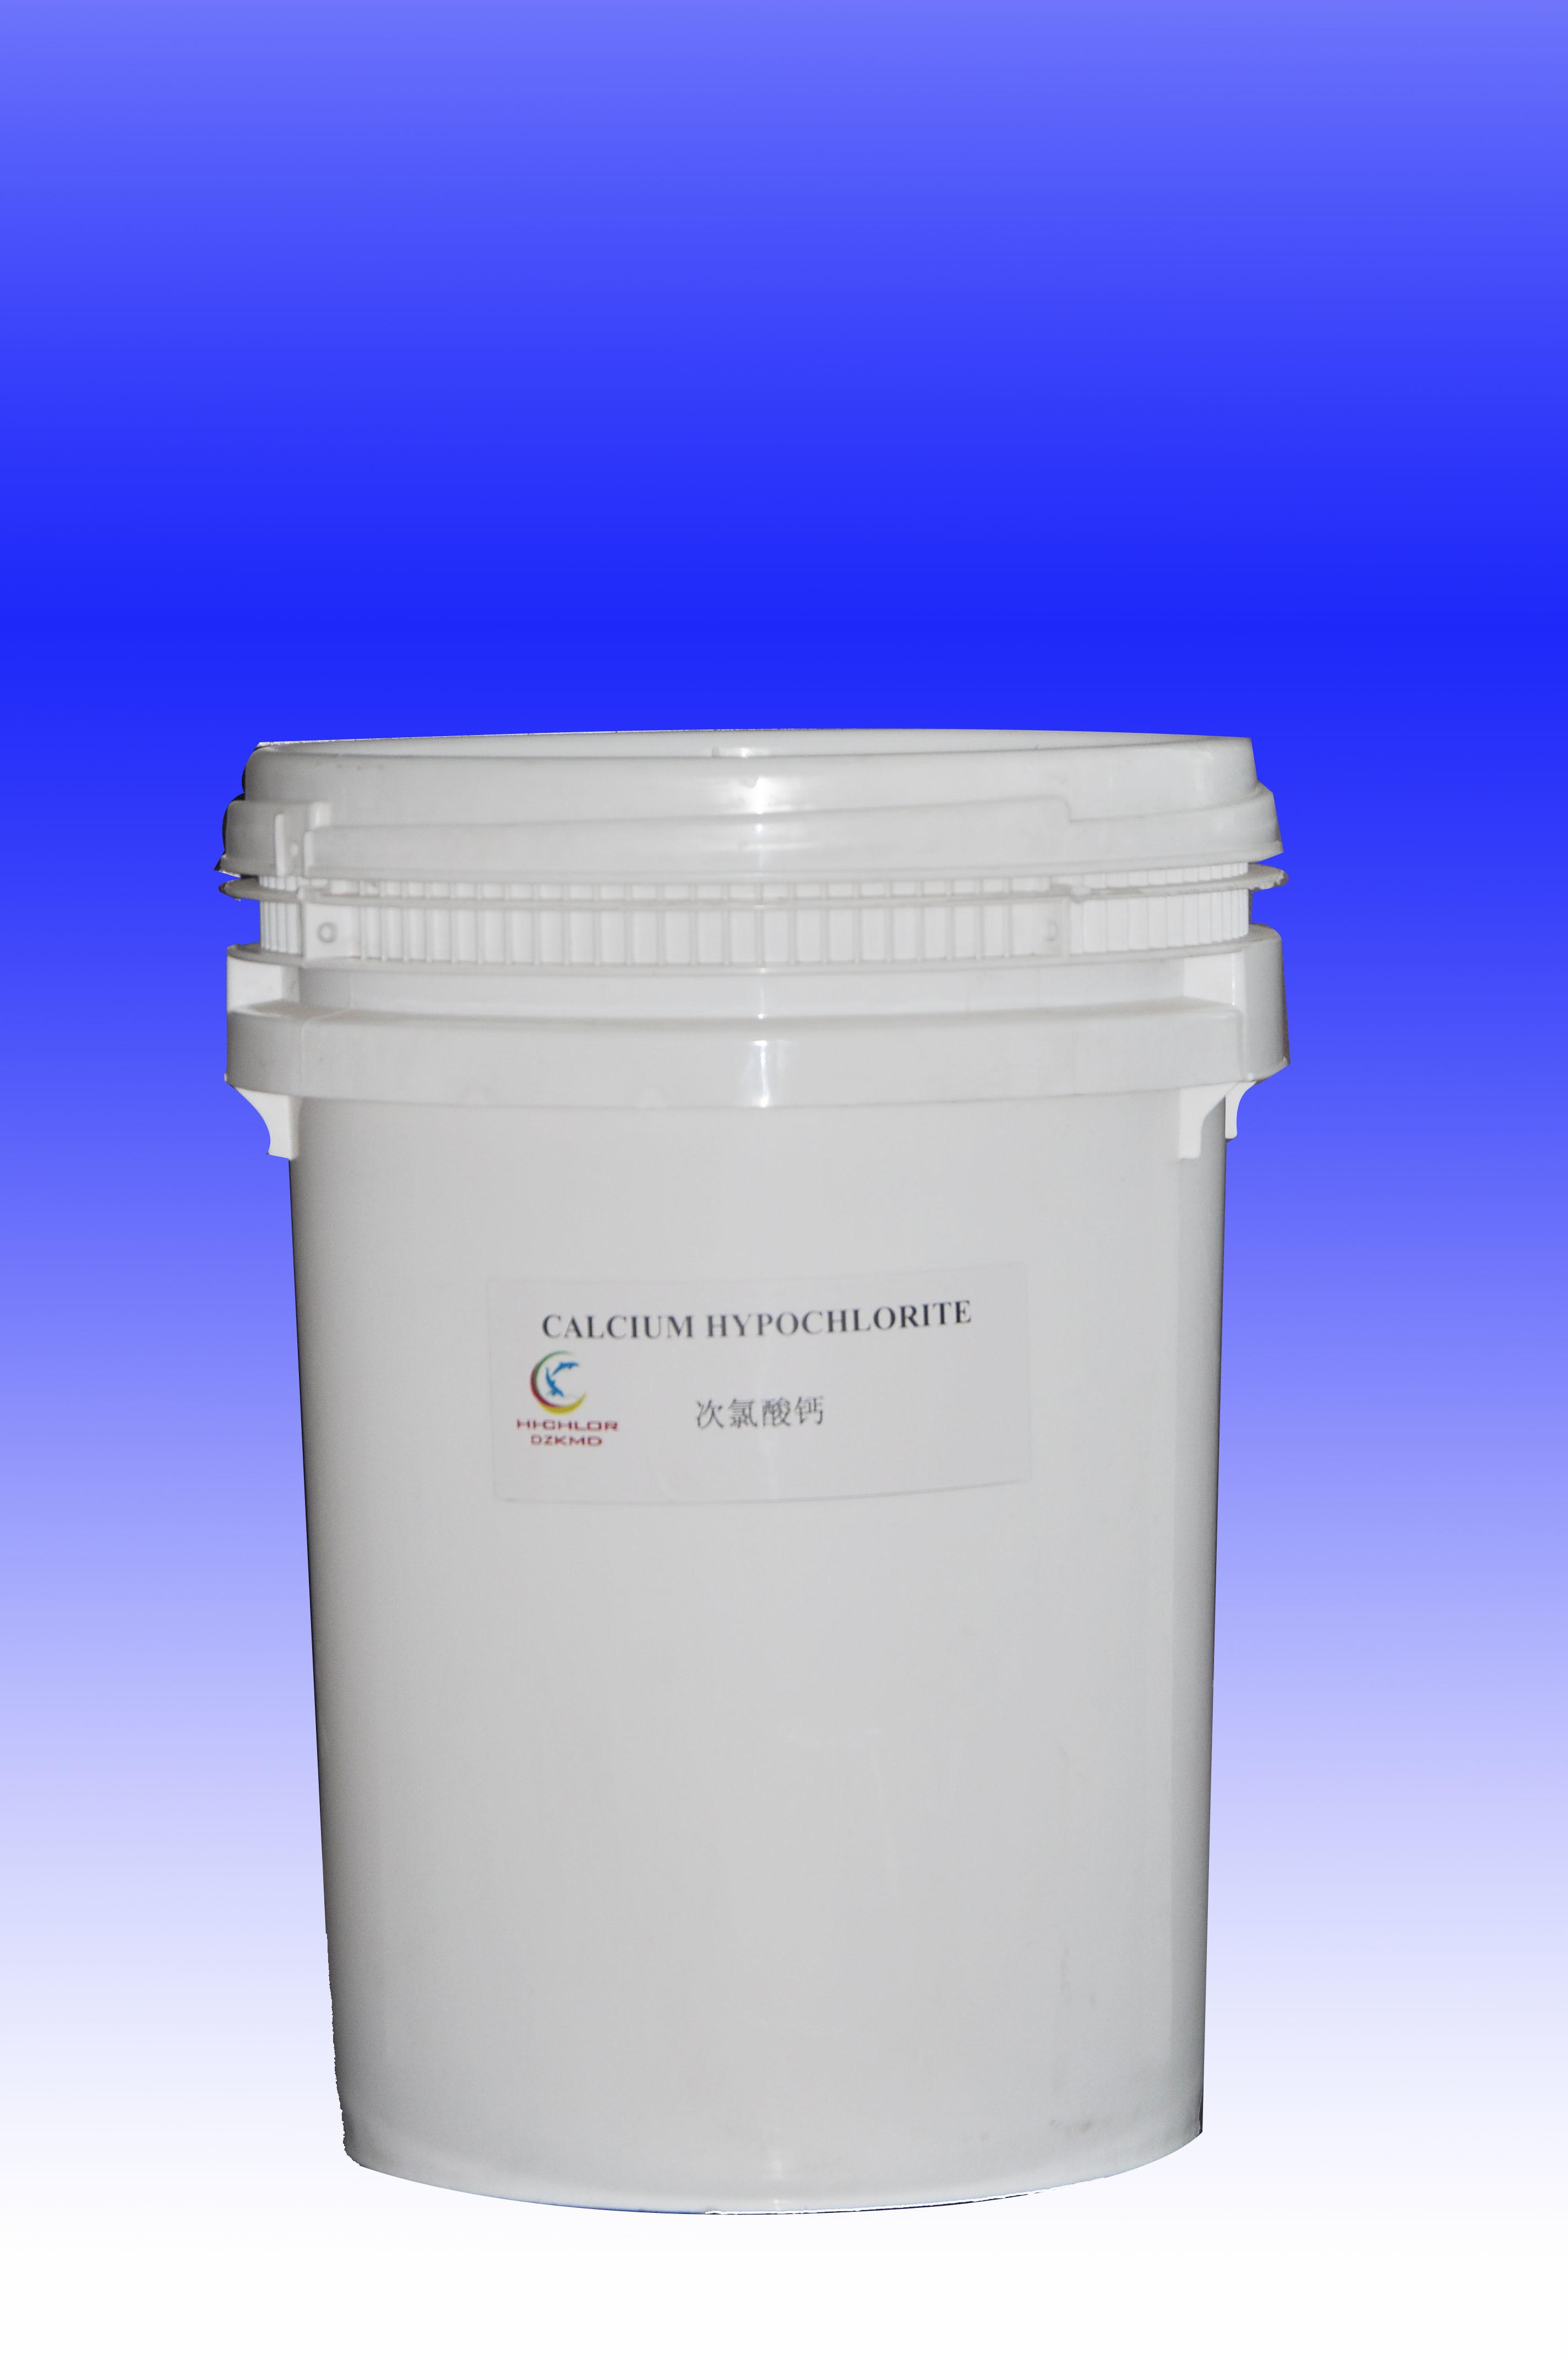 Calcium Hypochlorite Tablet 70% by Sodium Process